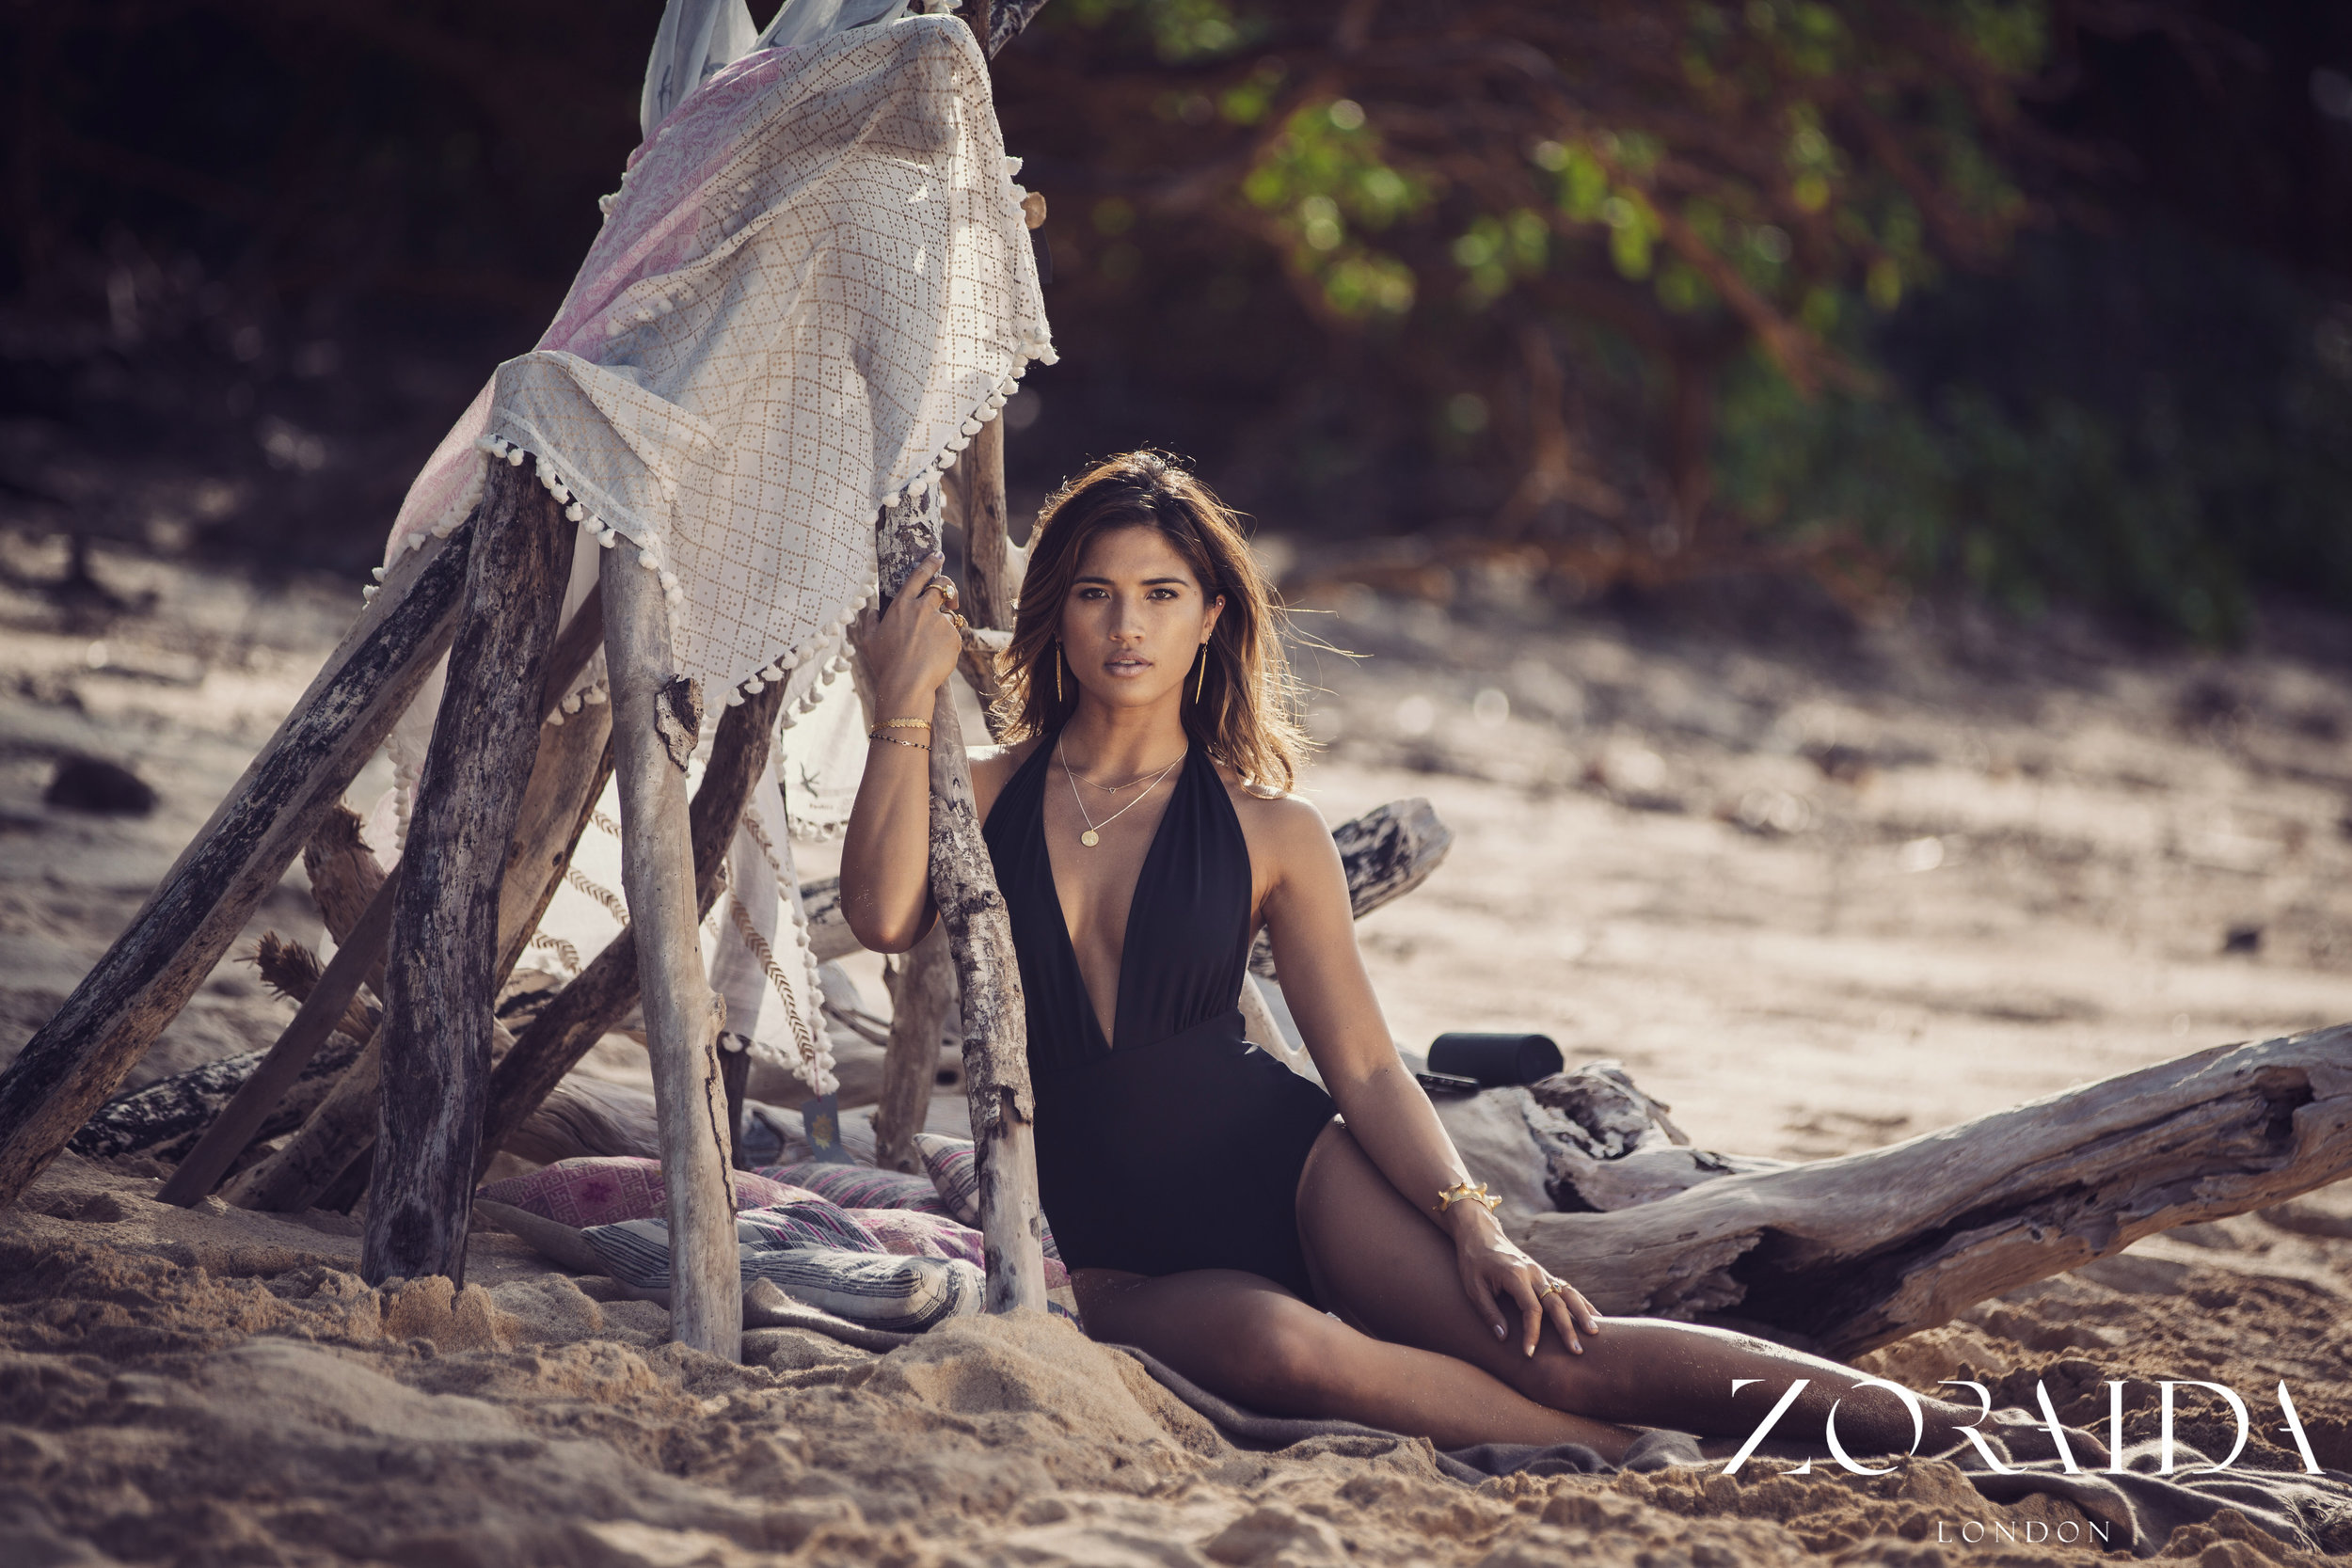 Catherine Zoraida Rocky Barnes 6.jpg